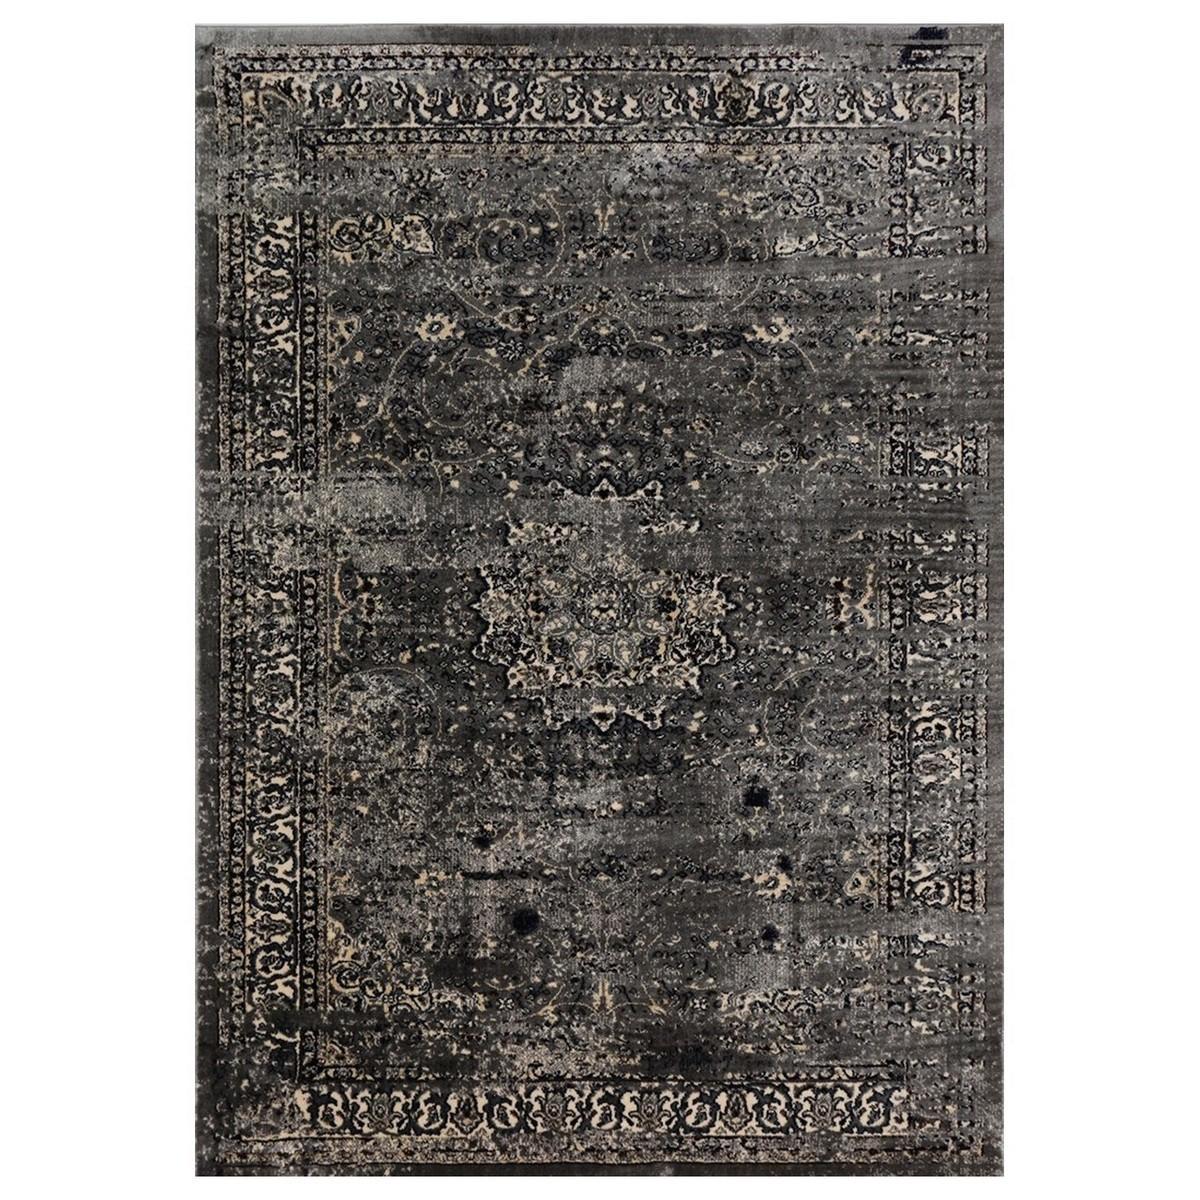 Artifact Parisa Distressed Oriental Rug, 200x290cm